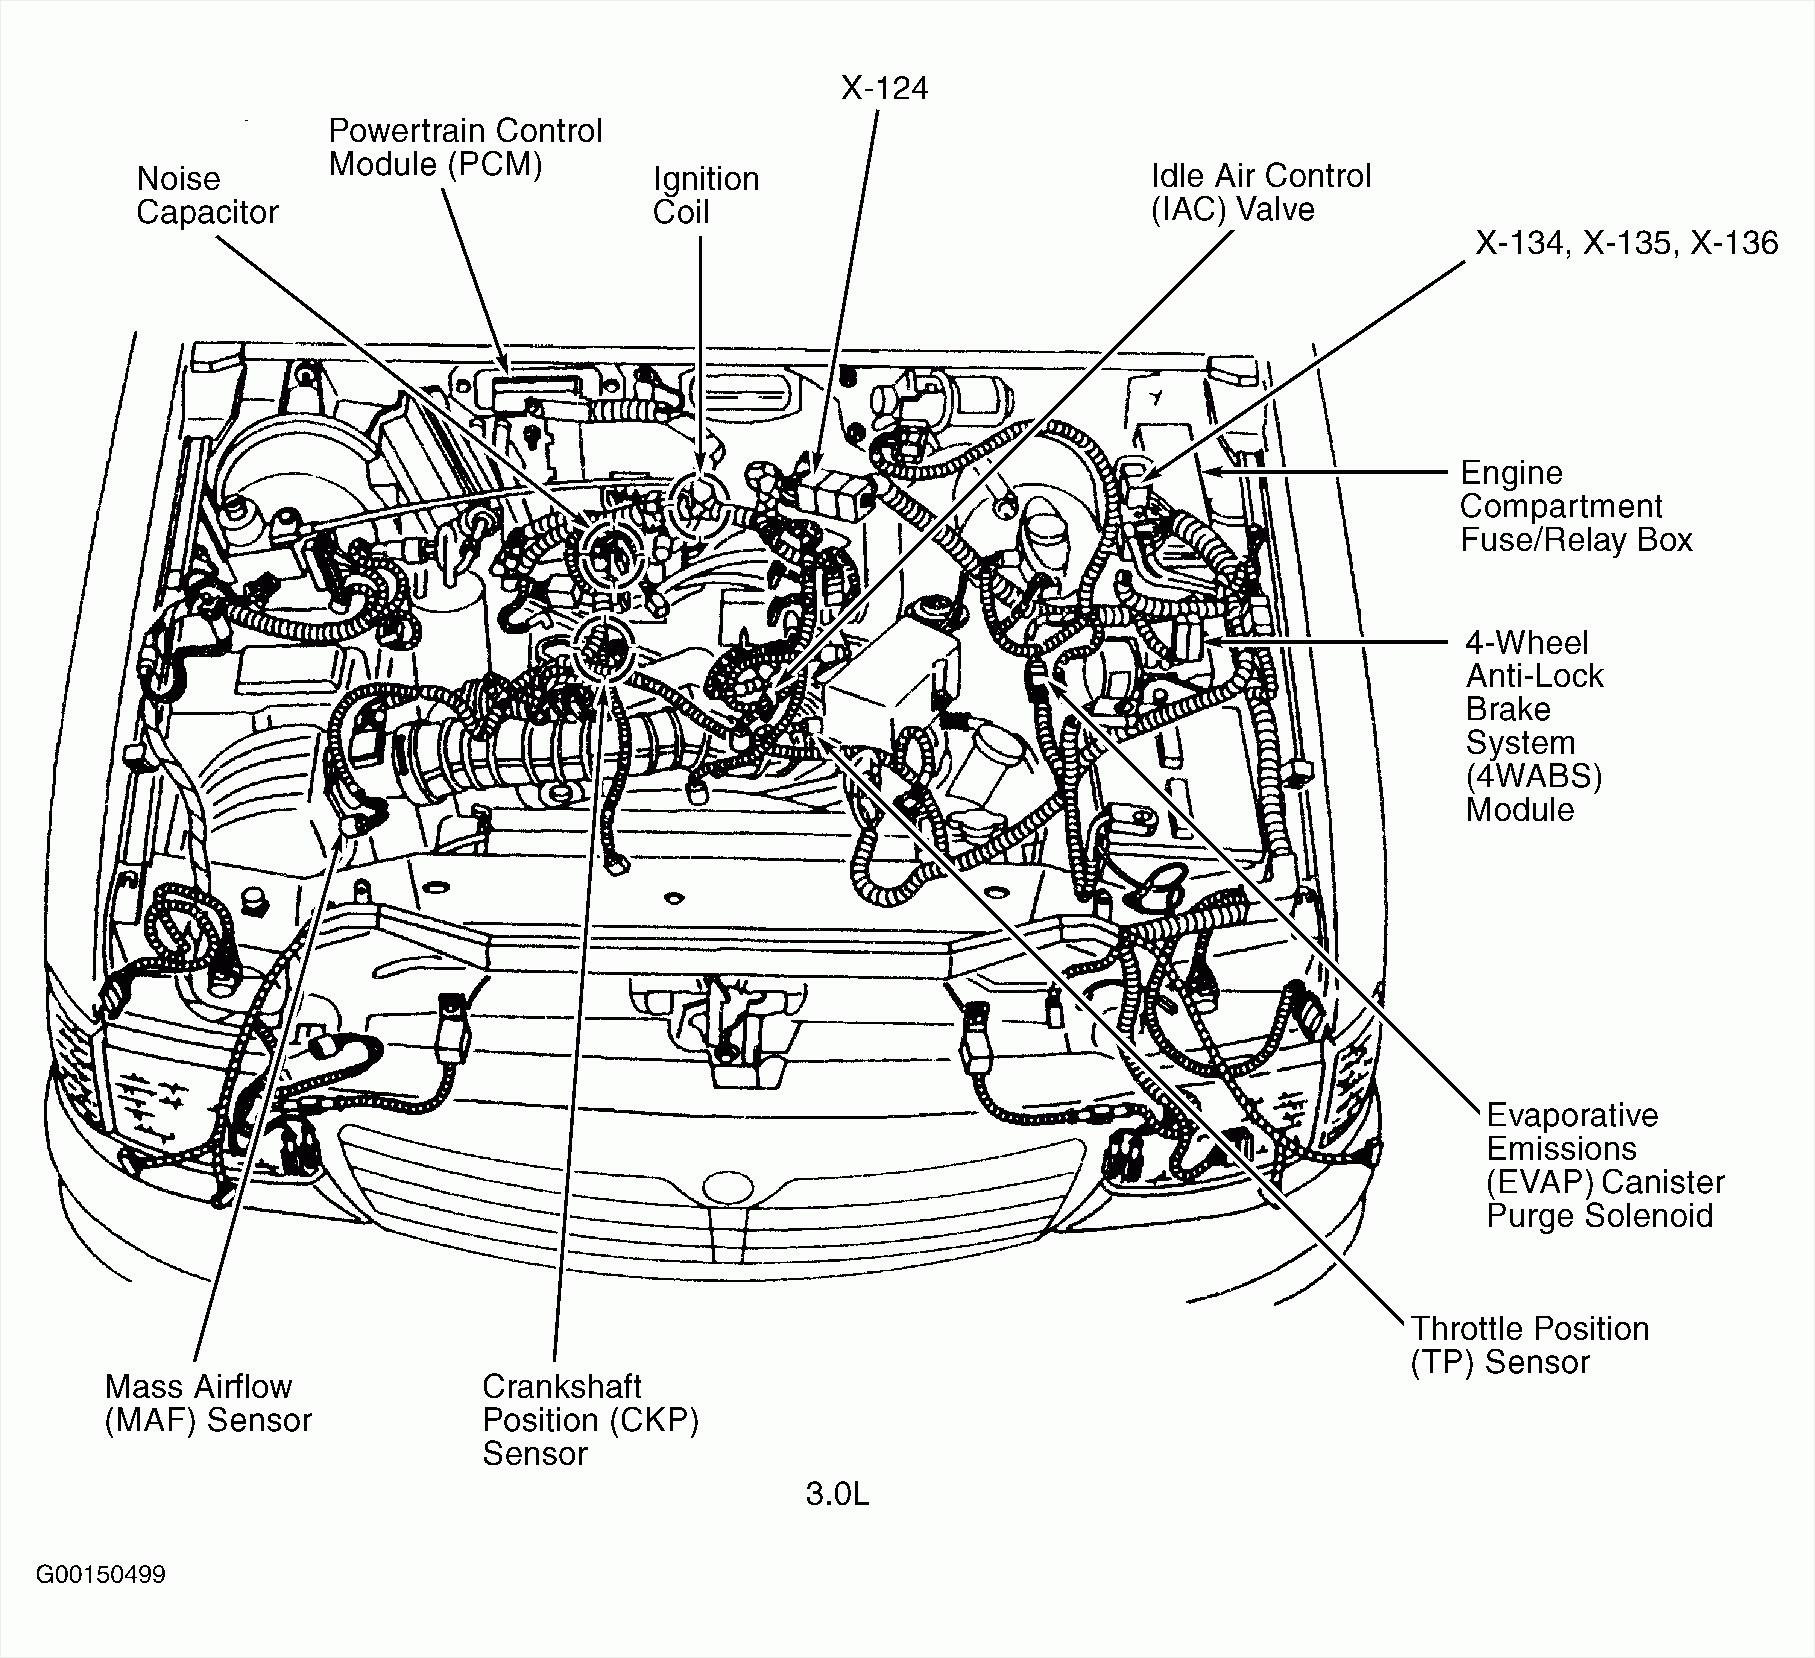 2001 toyota Highlander Engine Diagram 2001 toyota Tundra Engine Diagram Wiring Diagram New Of 2001 toyota Highlander Engine Diagram